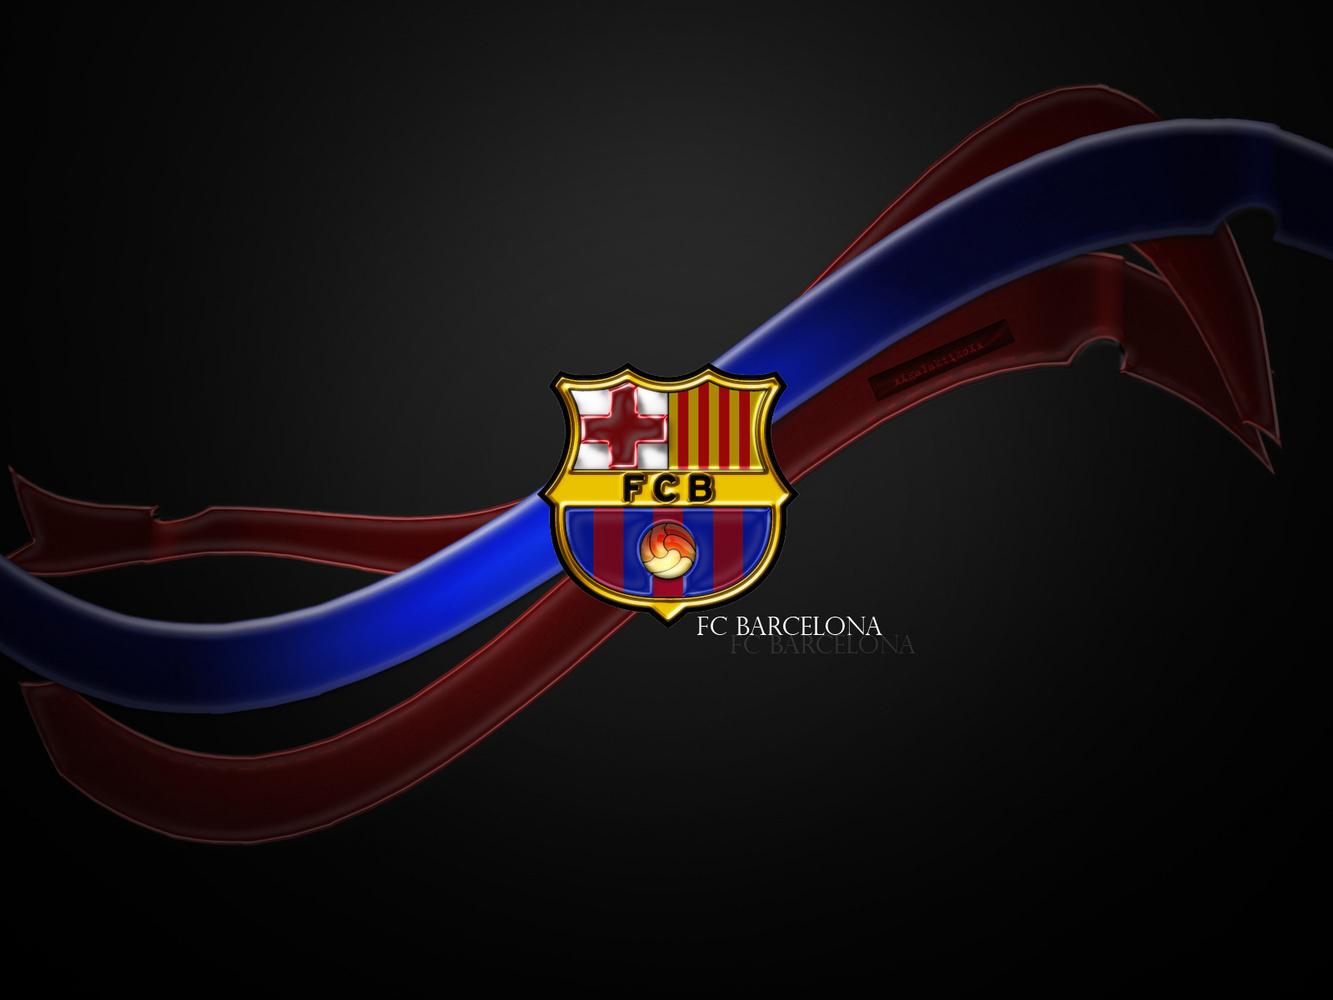 FC Barcelona FC Barcelona Logo Wallpaper 1333x1000